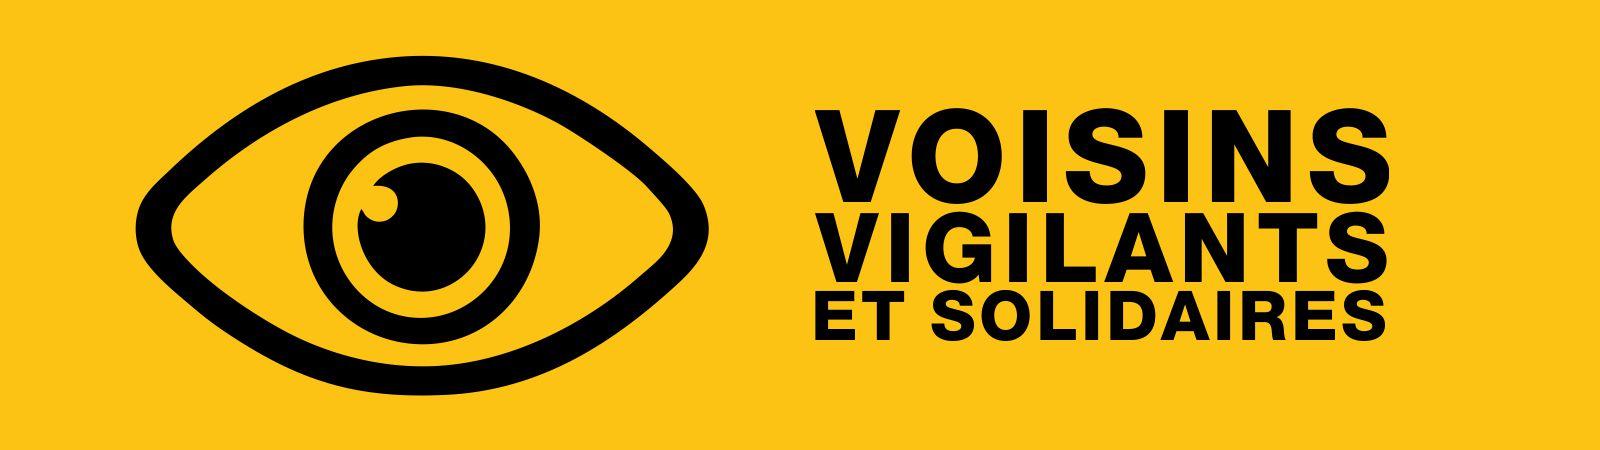 voisins_vigilants_solidaires_logo.jpg